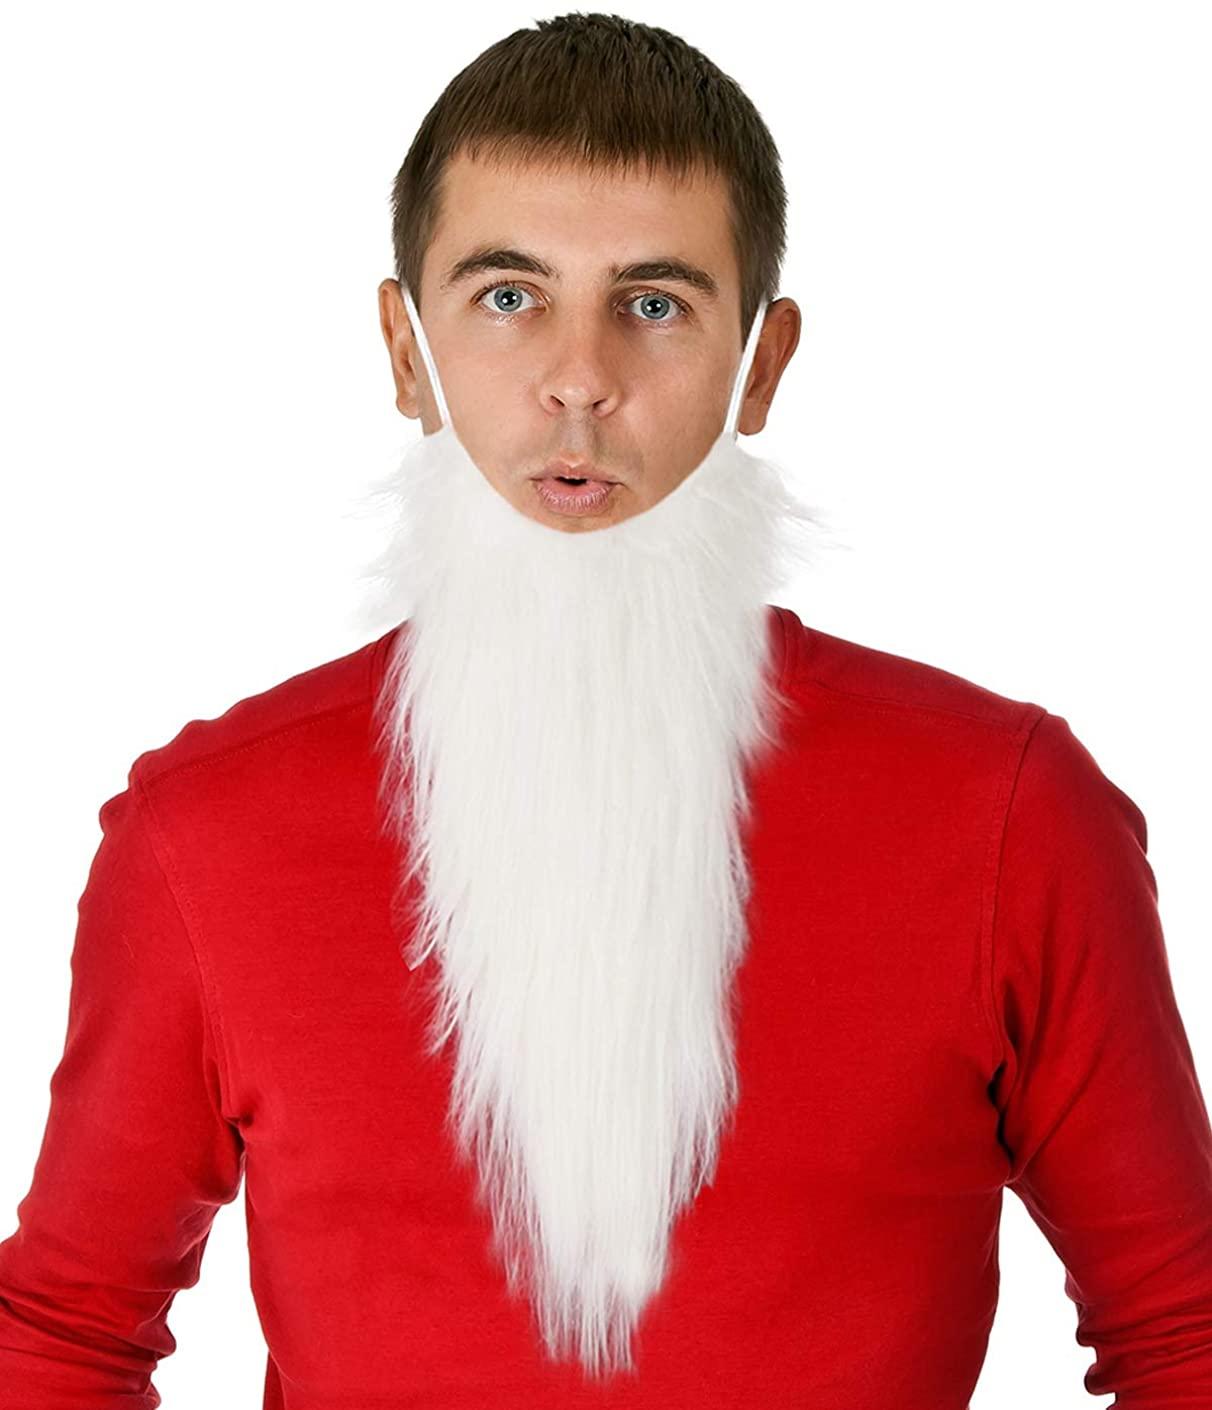 Costume Adventure White Gnome Dwarf Character Costume Beard - One Size